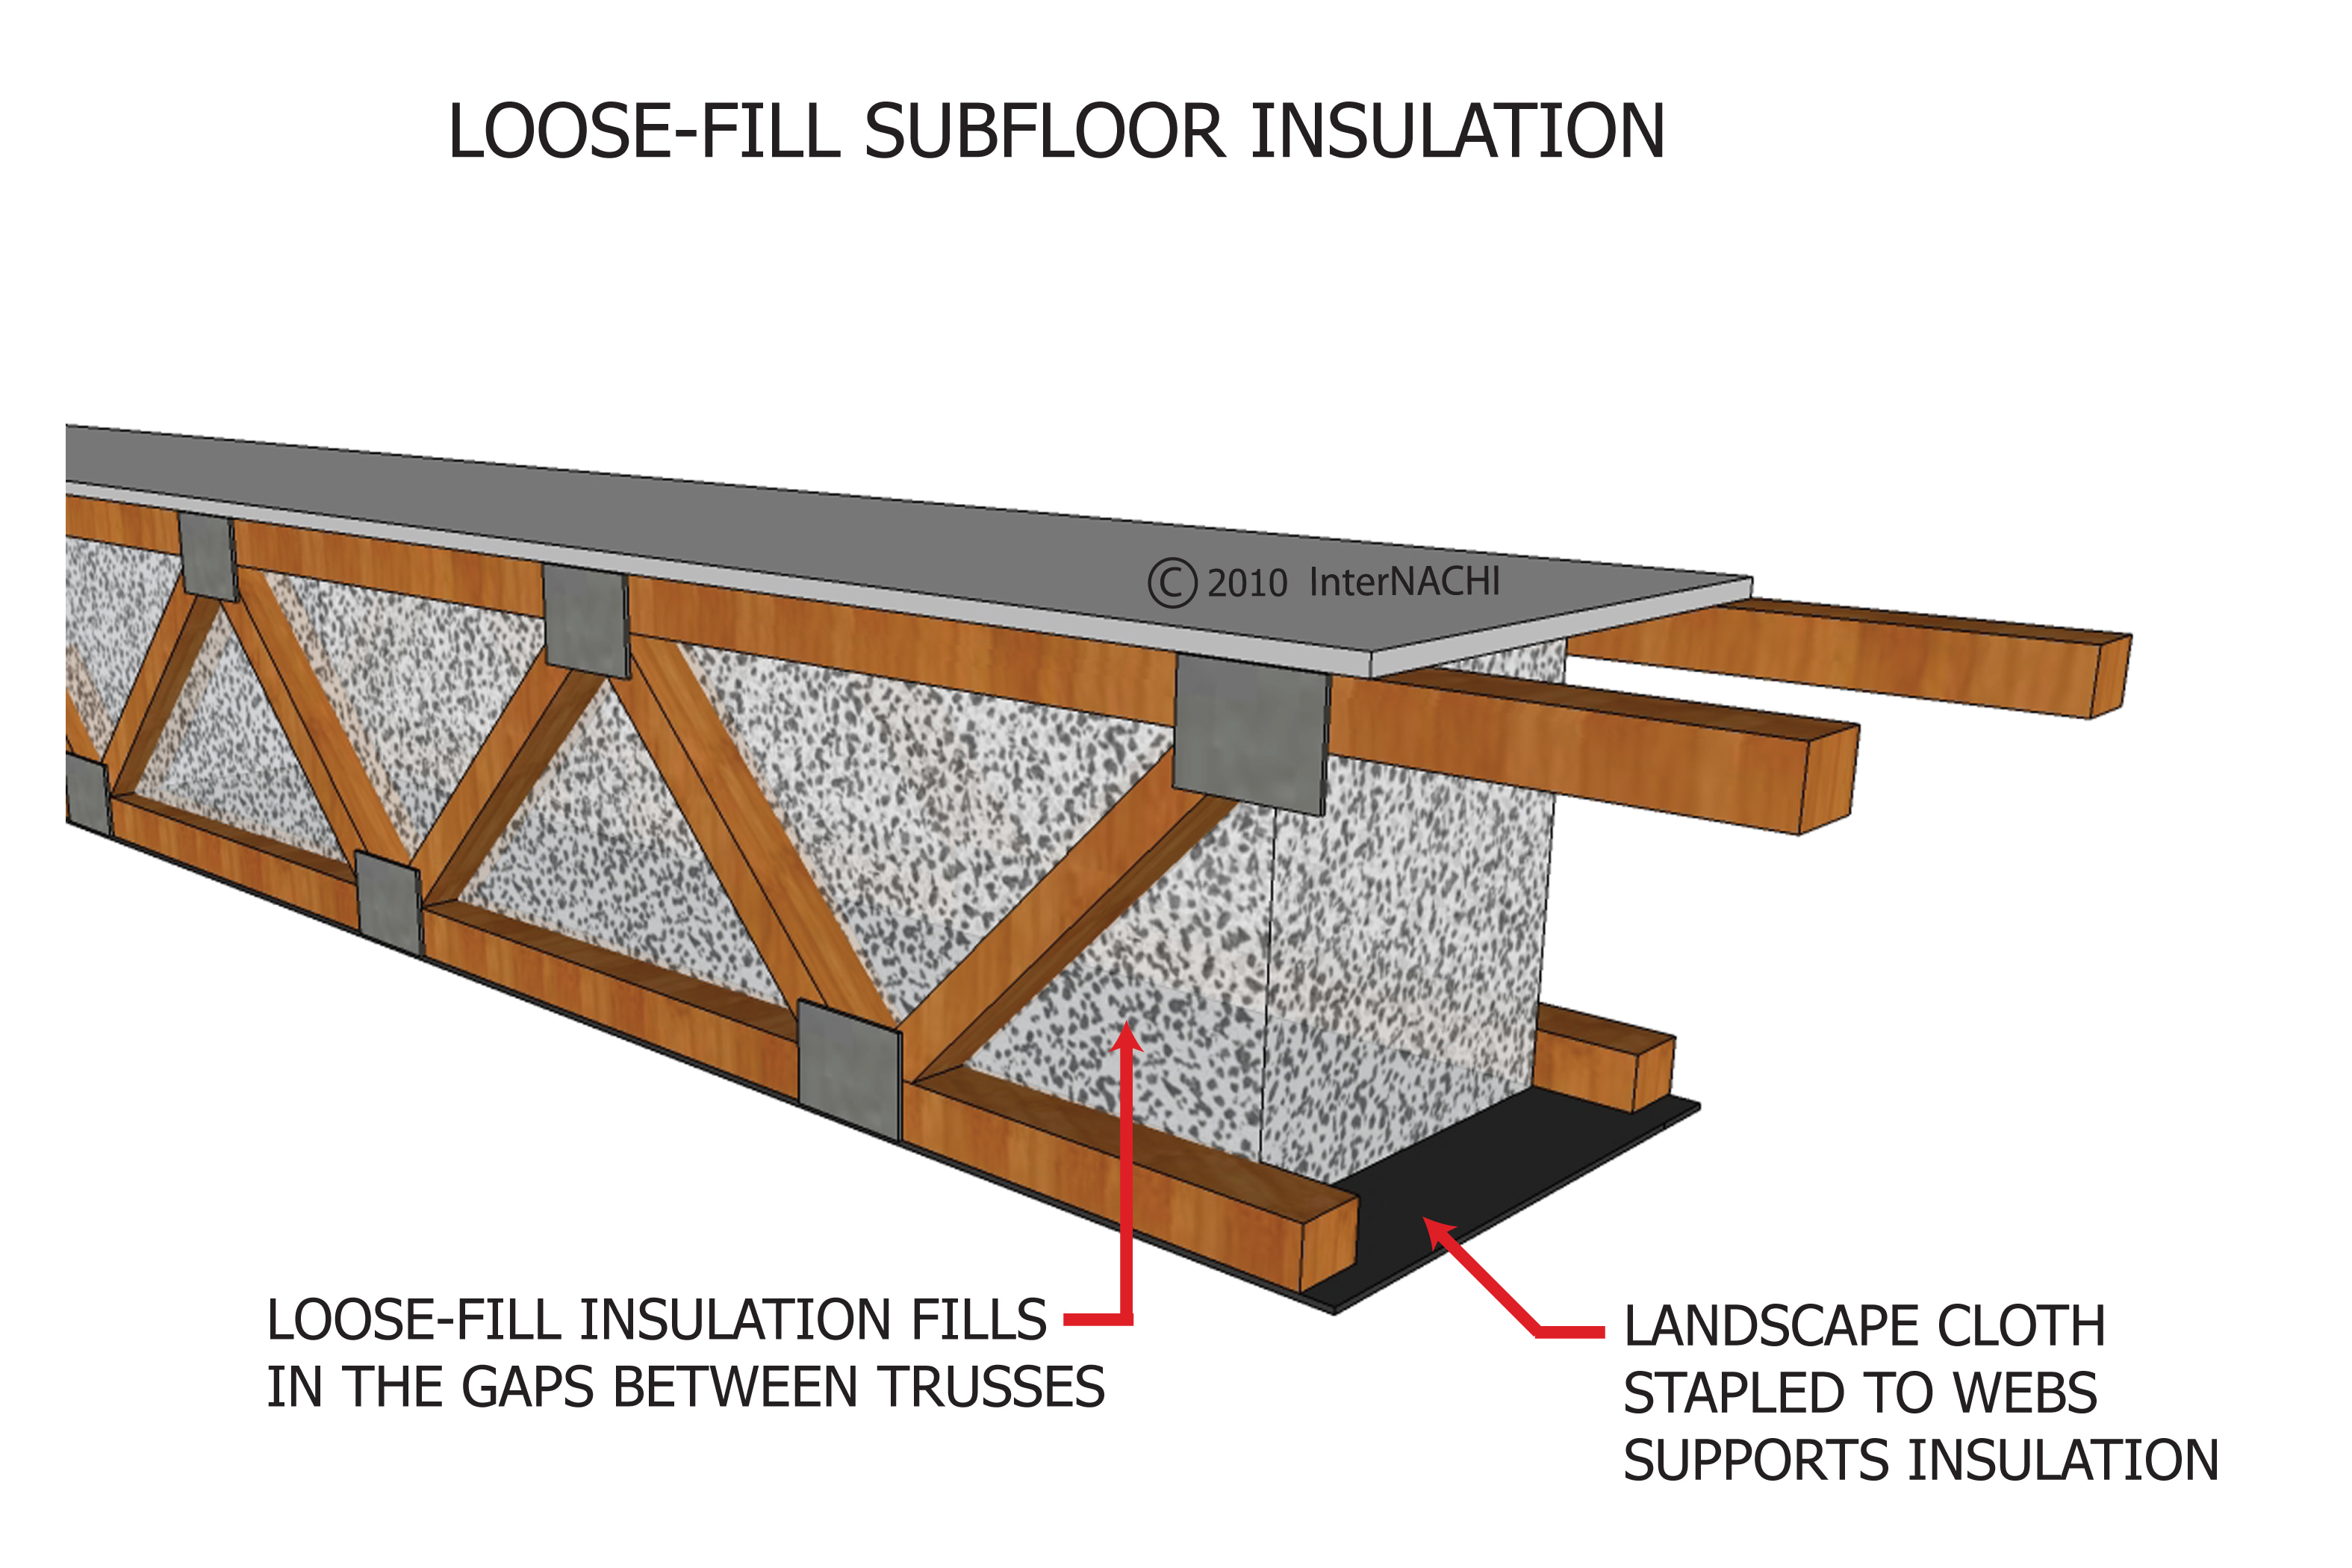 Loose-fill subfloor insulation.